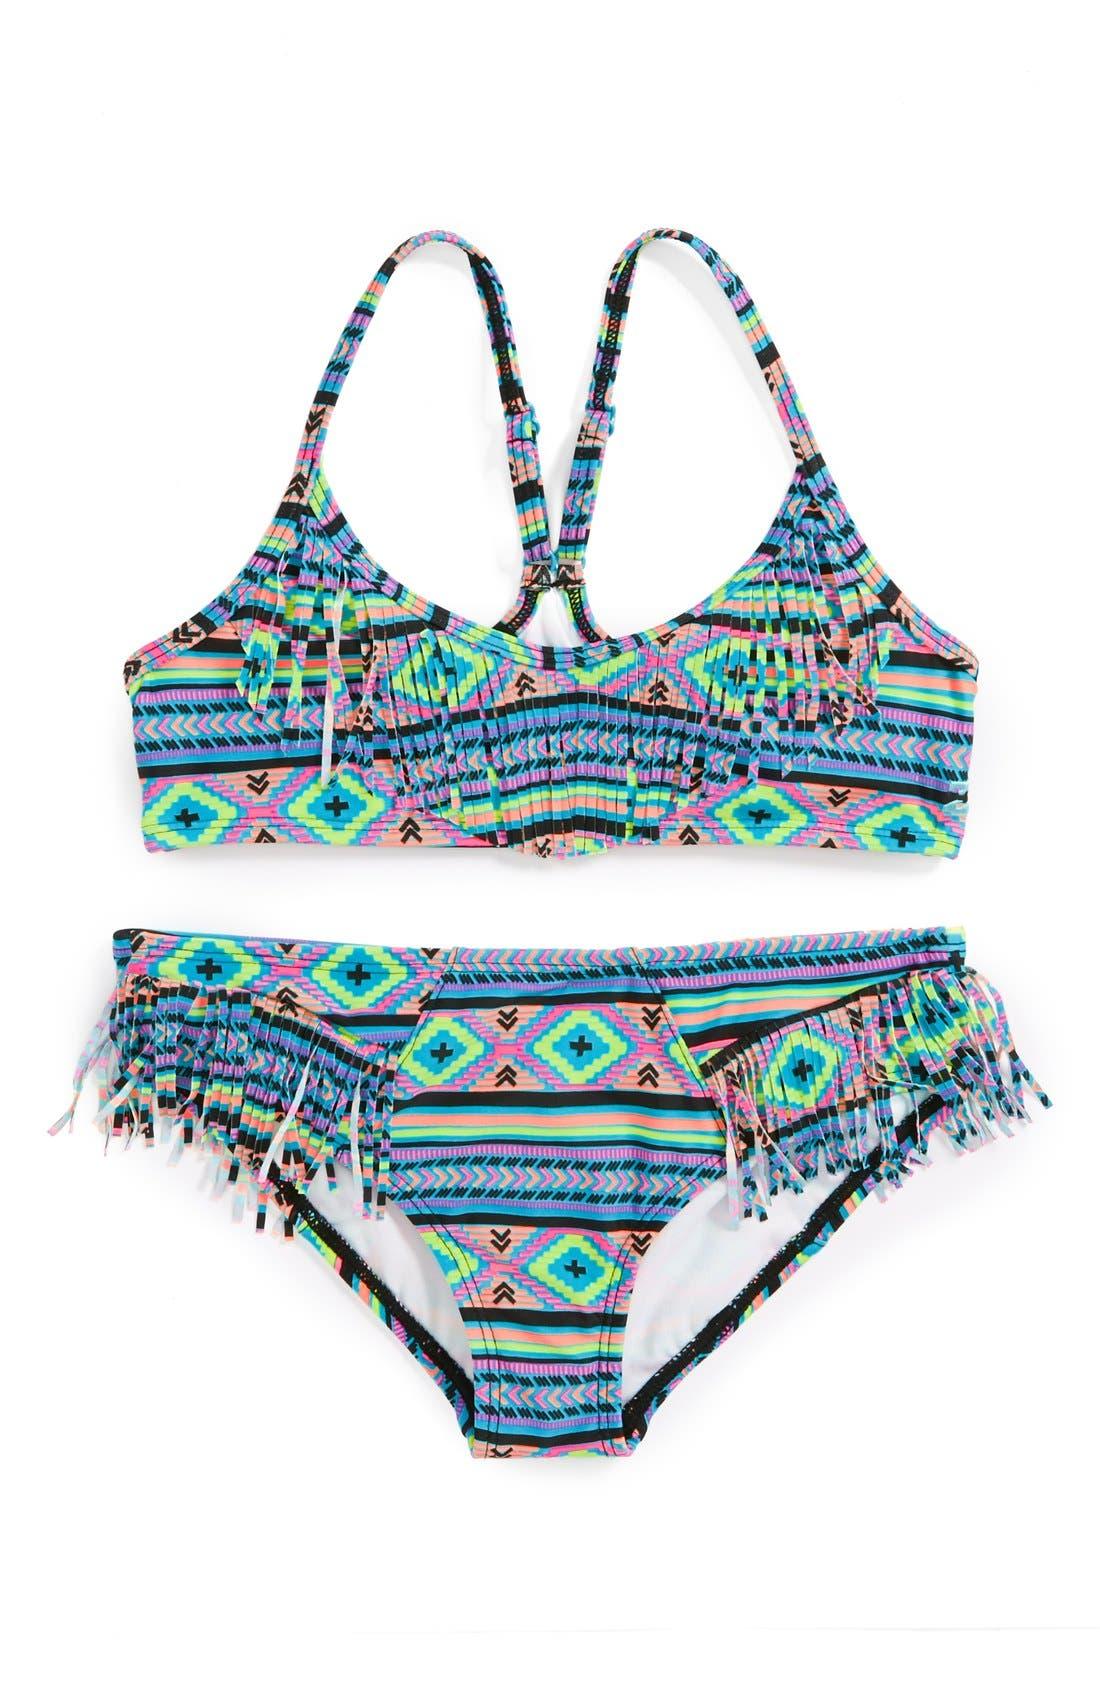 Alternate Image 1 Selected - Billabong 'Heat Wave' Racerback Two-Piece Swimsuit (Little Girls)(Online Only)